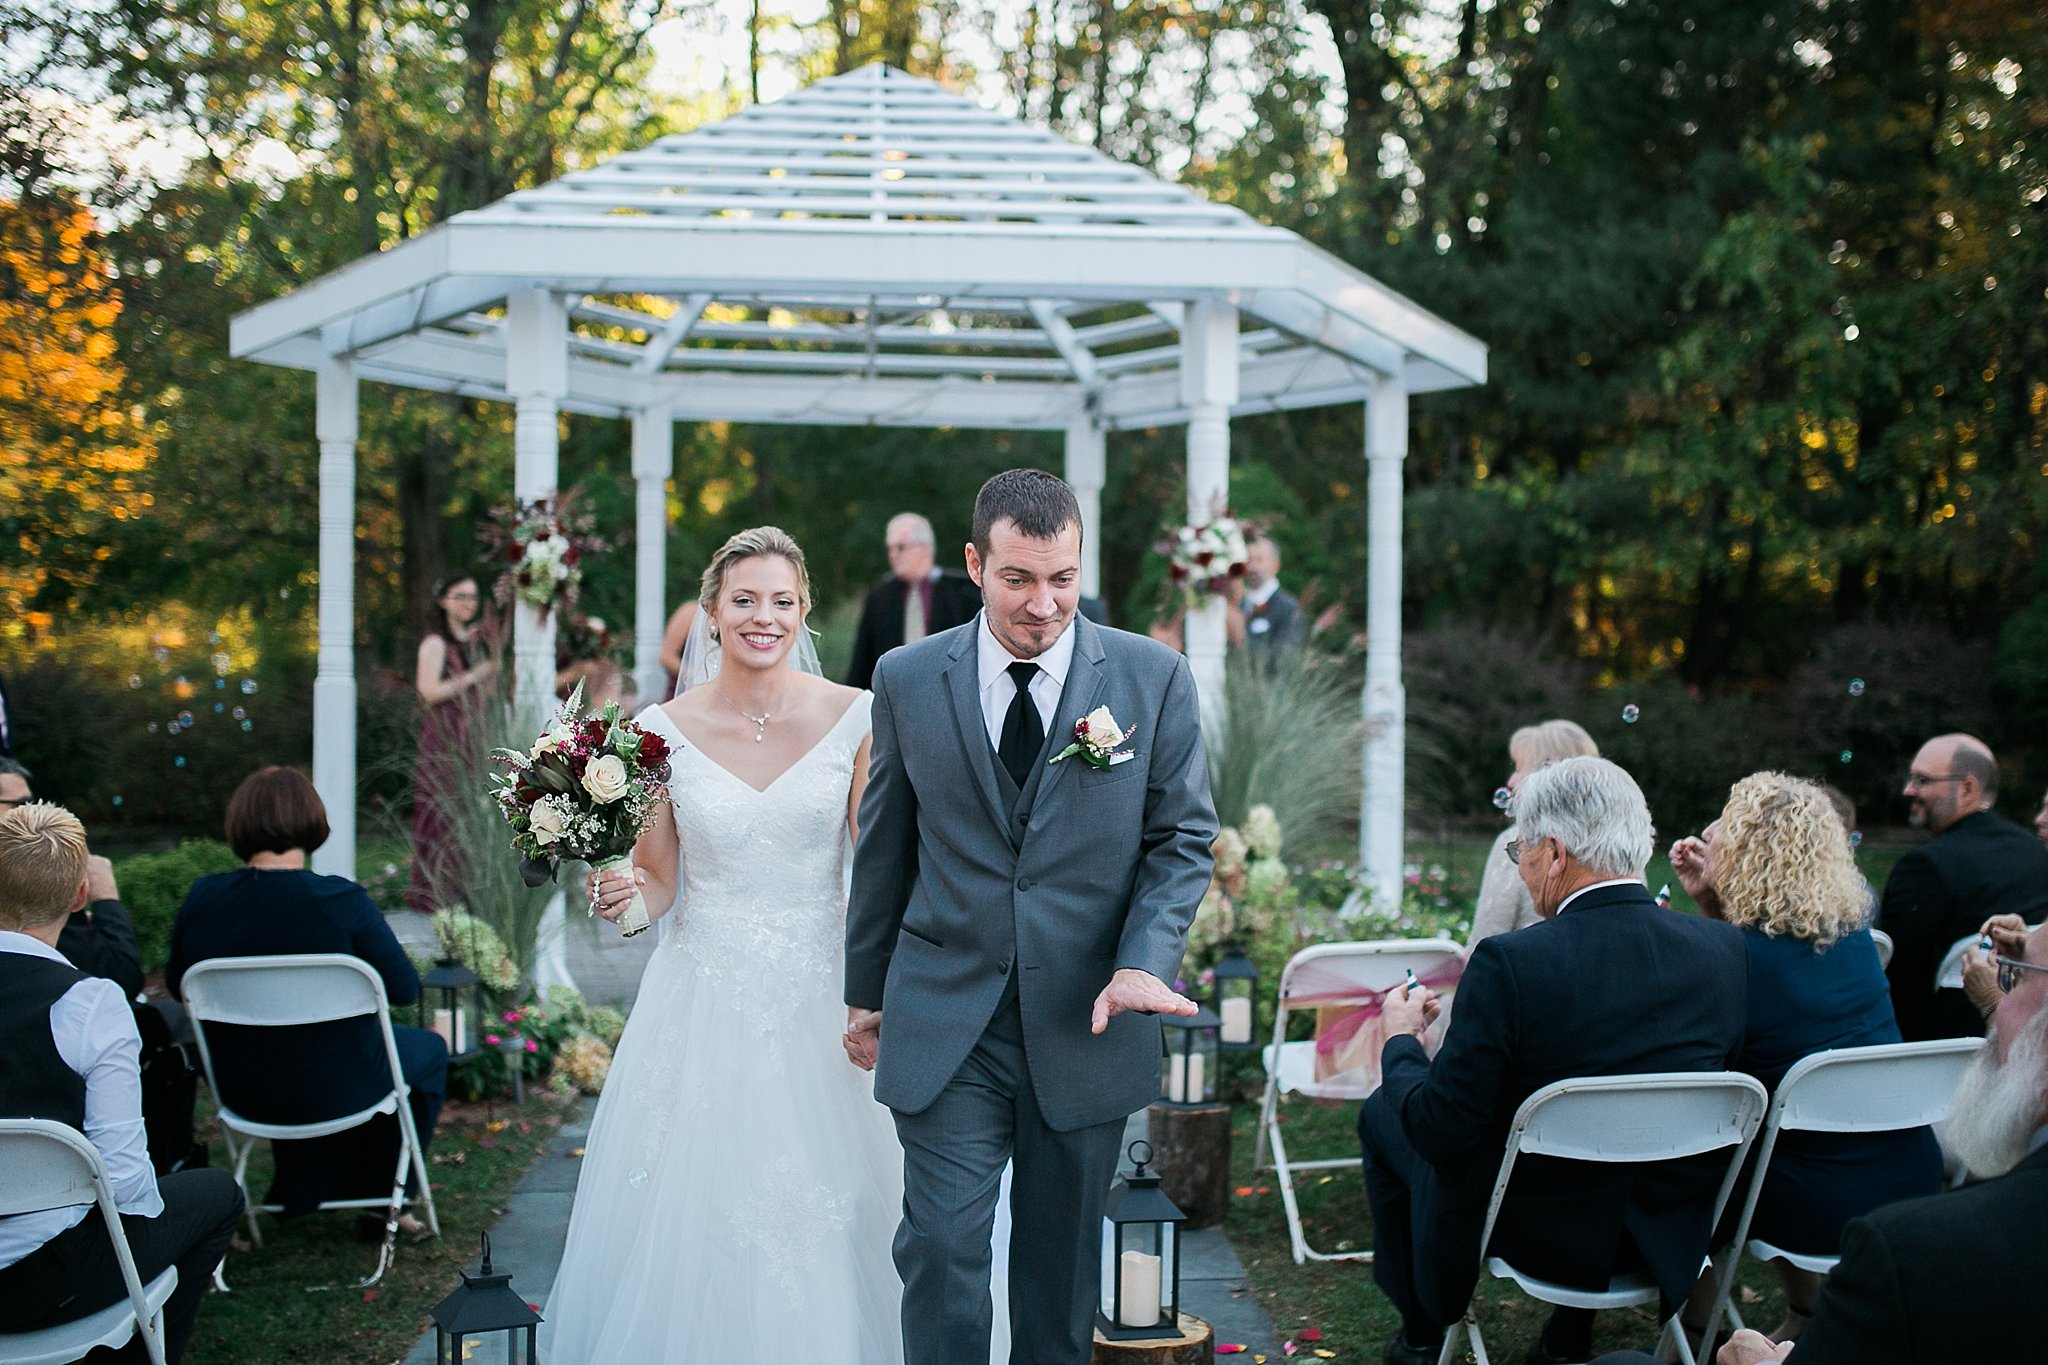 New Windsor New York Hudson Valley New York Wedding Photographer 50.jpg